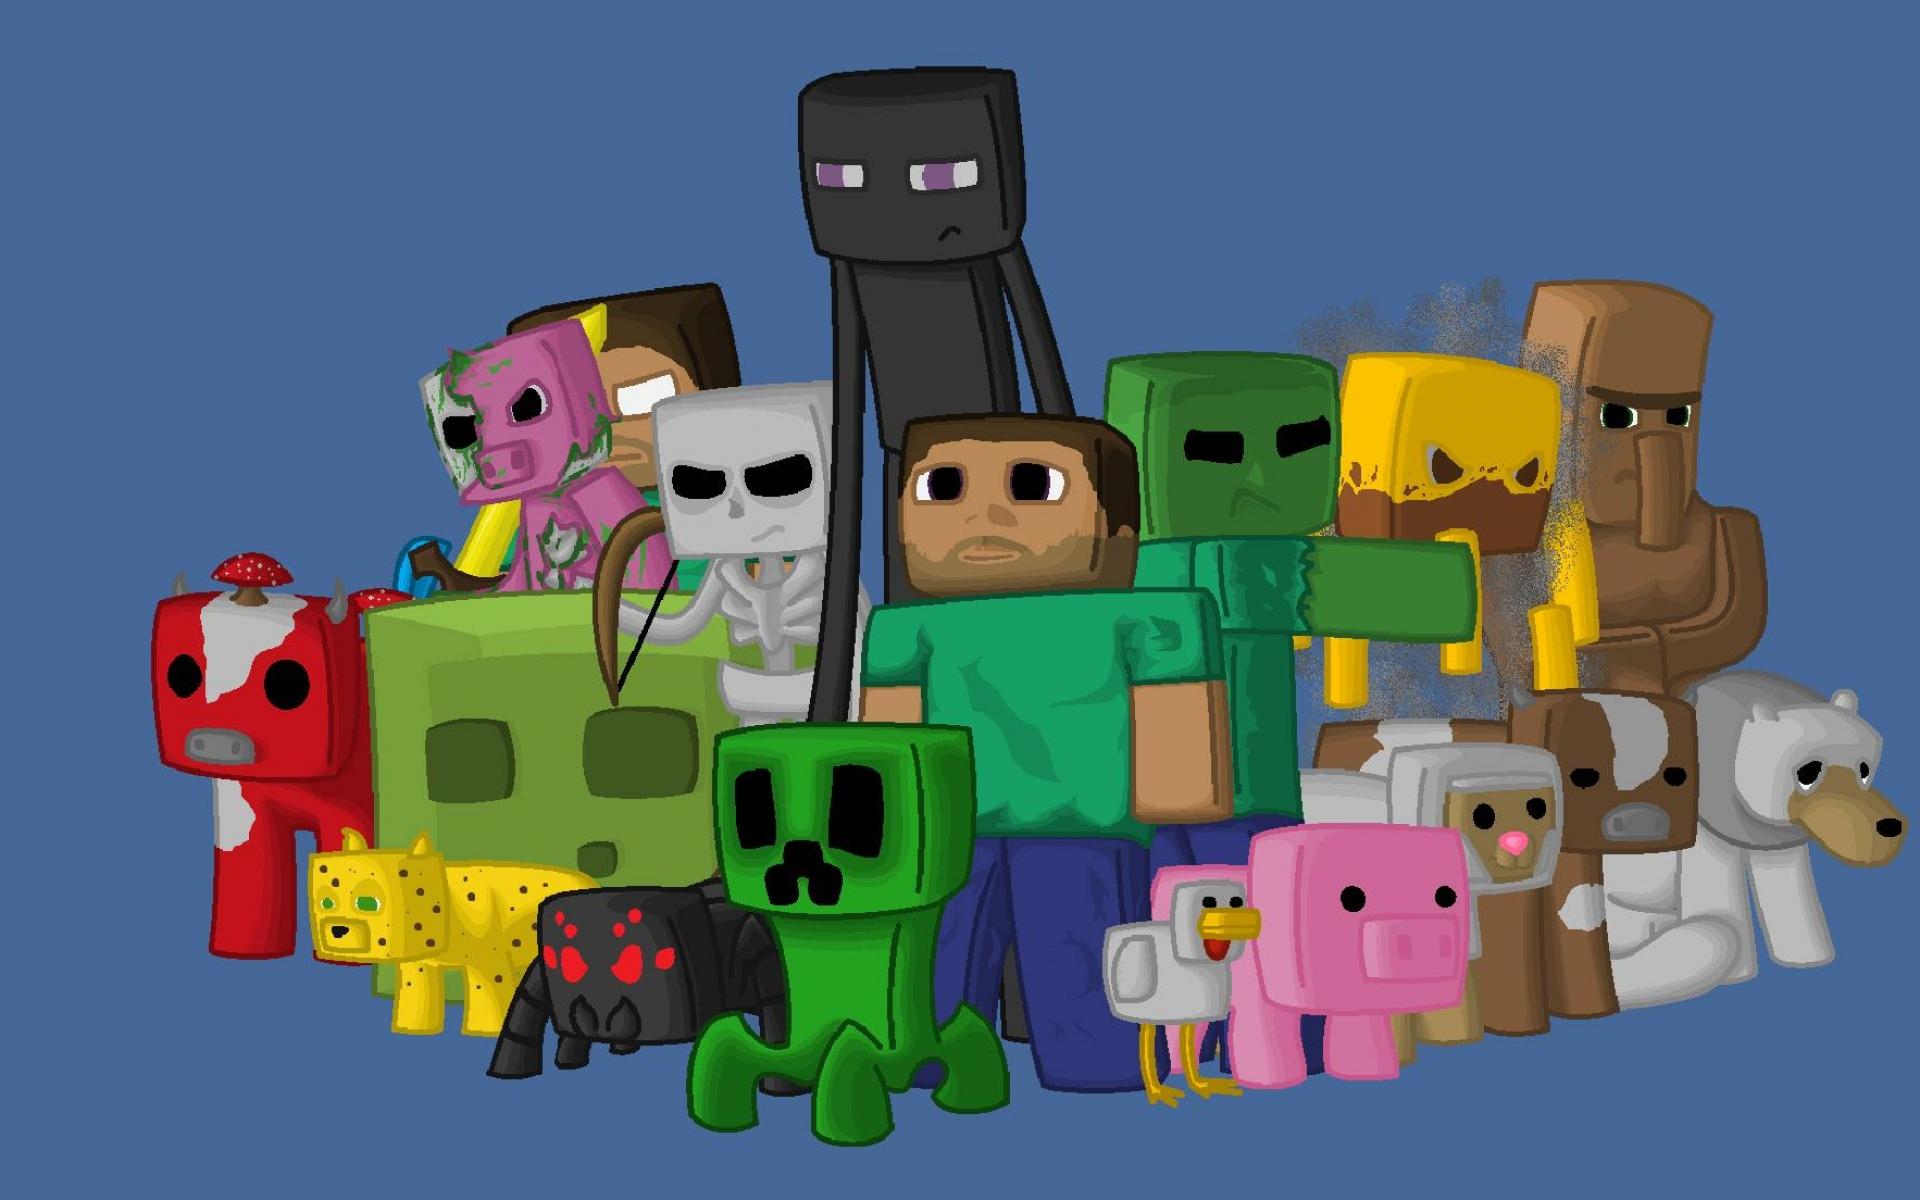 Картинки Minecraft, персонажи, игра, пиксели, java фото и обои на рабочий стол